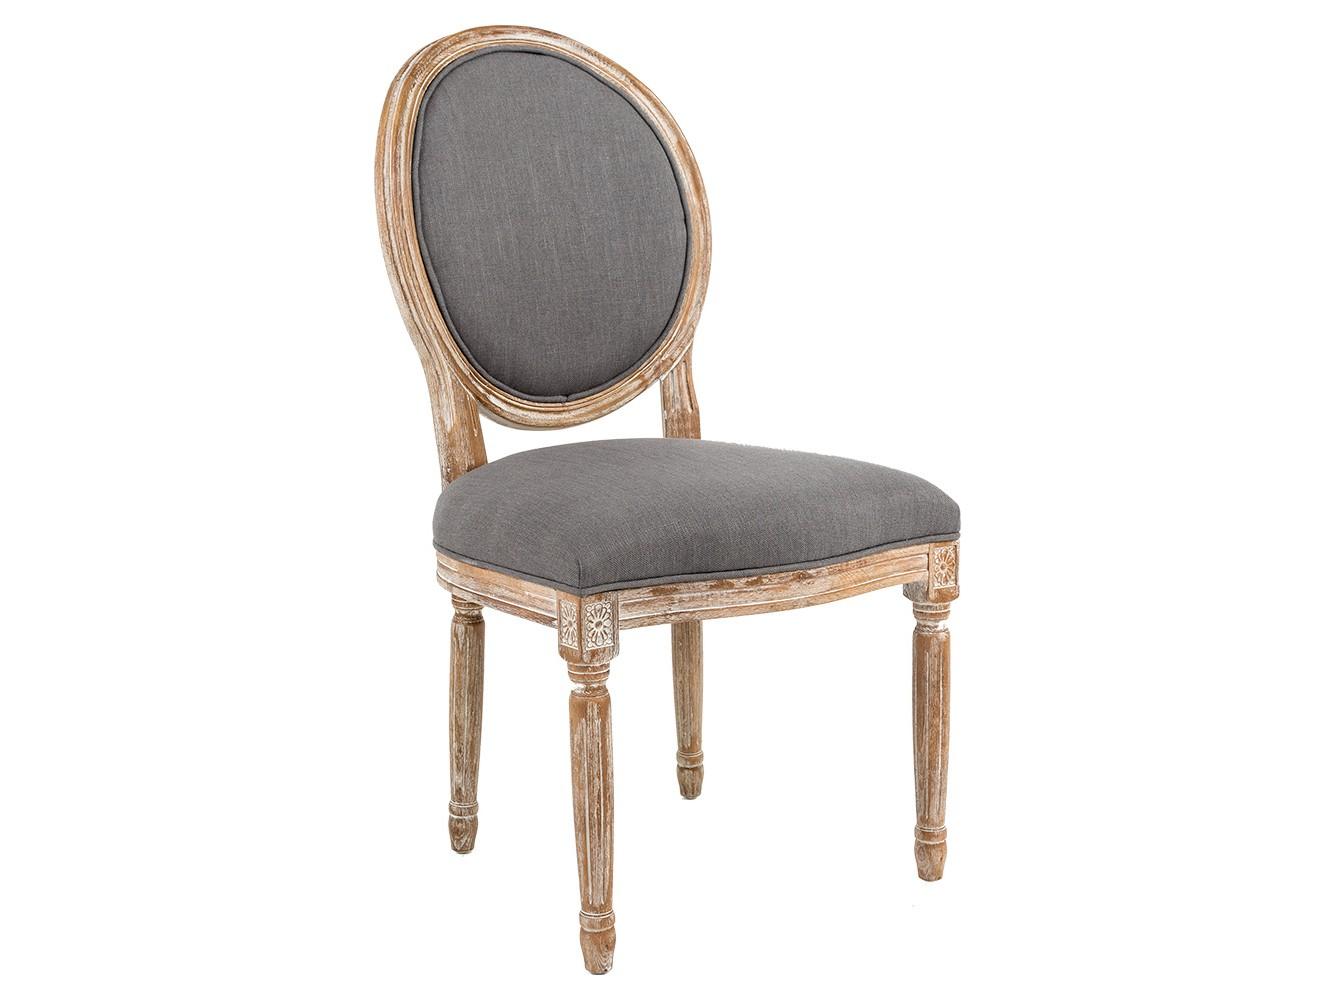 Кухонный стул Object Desire 15438258 от thefurnish